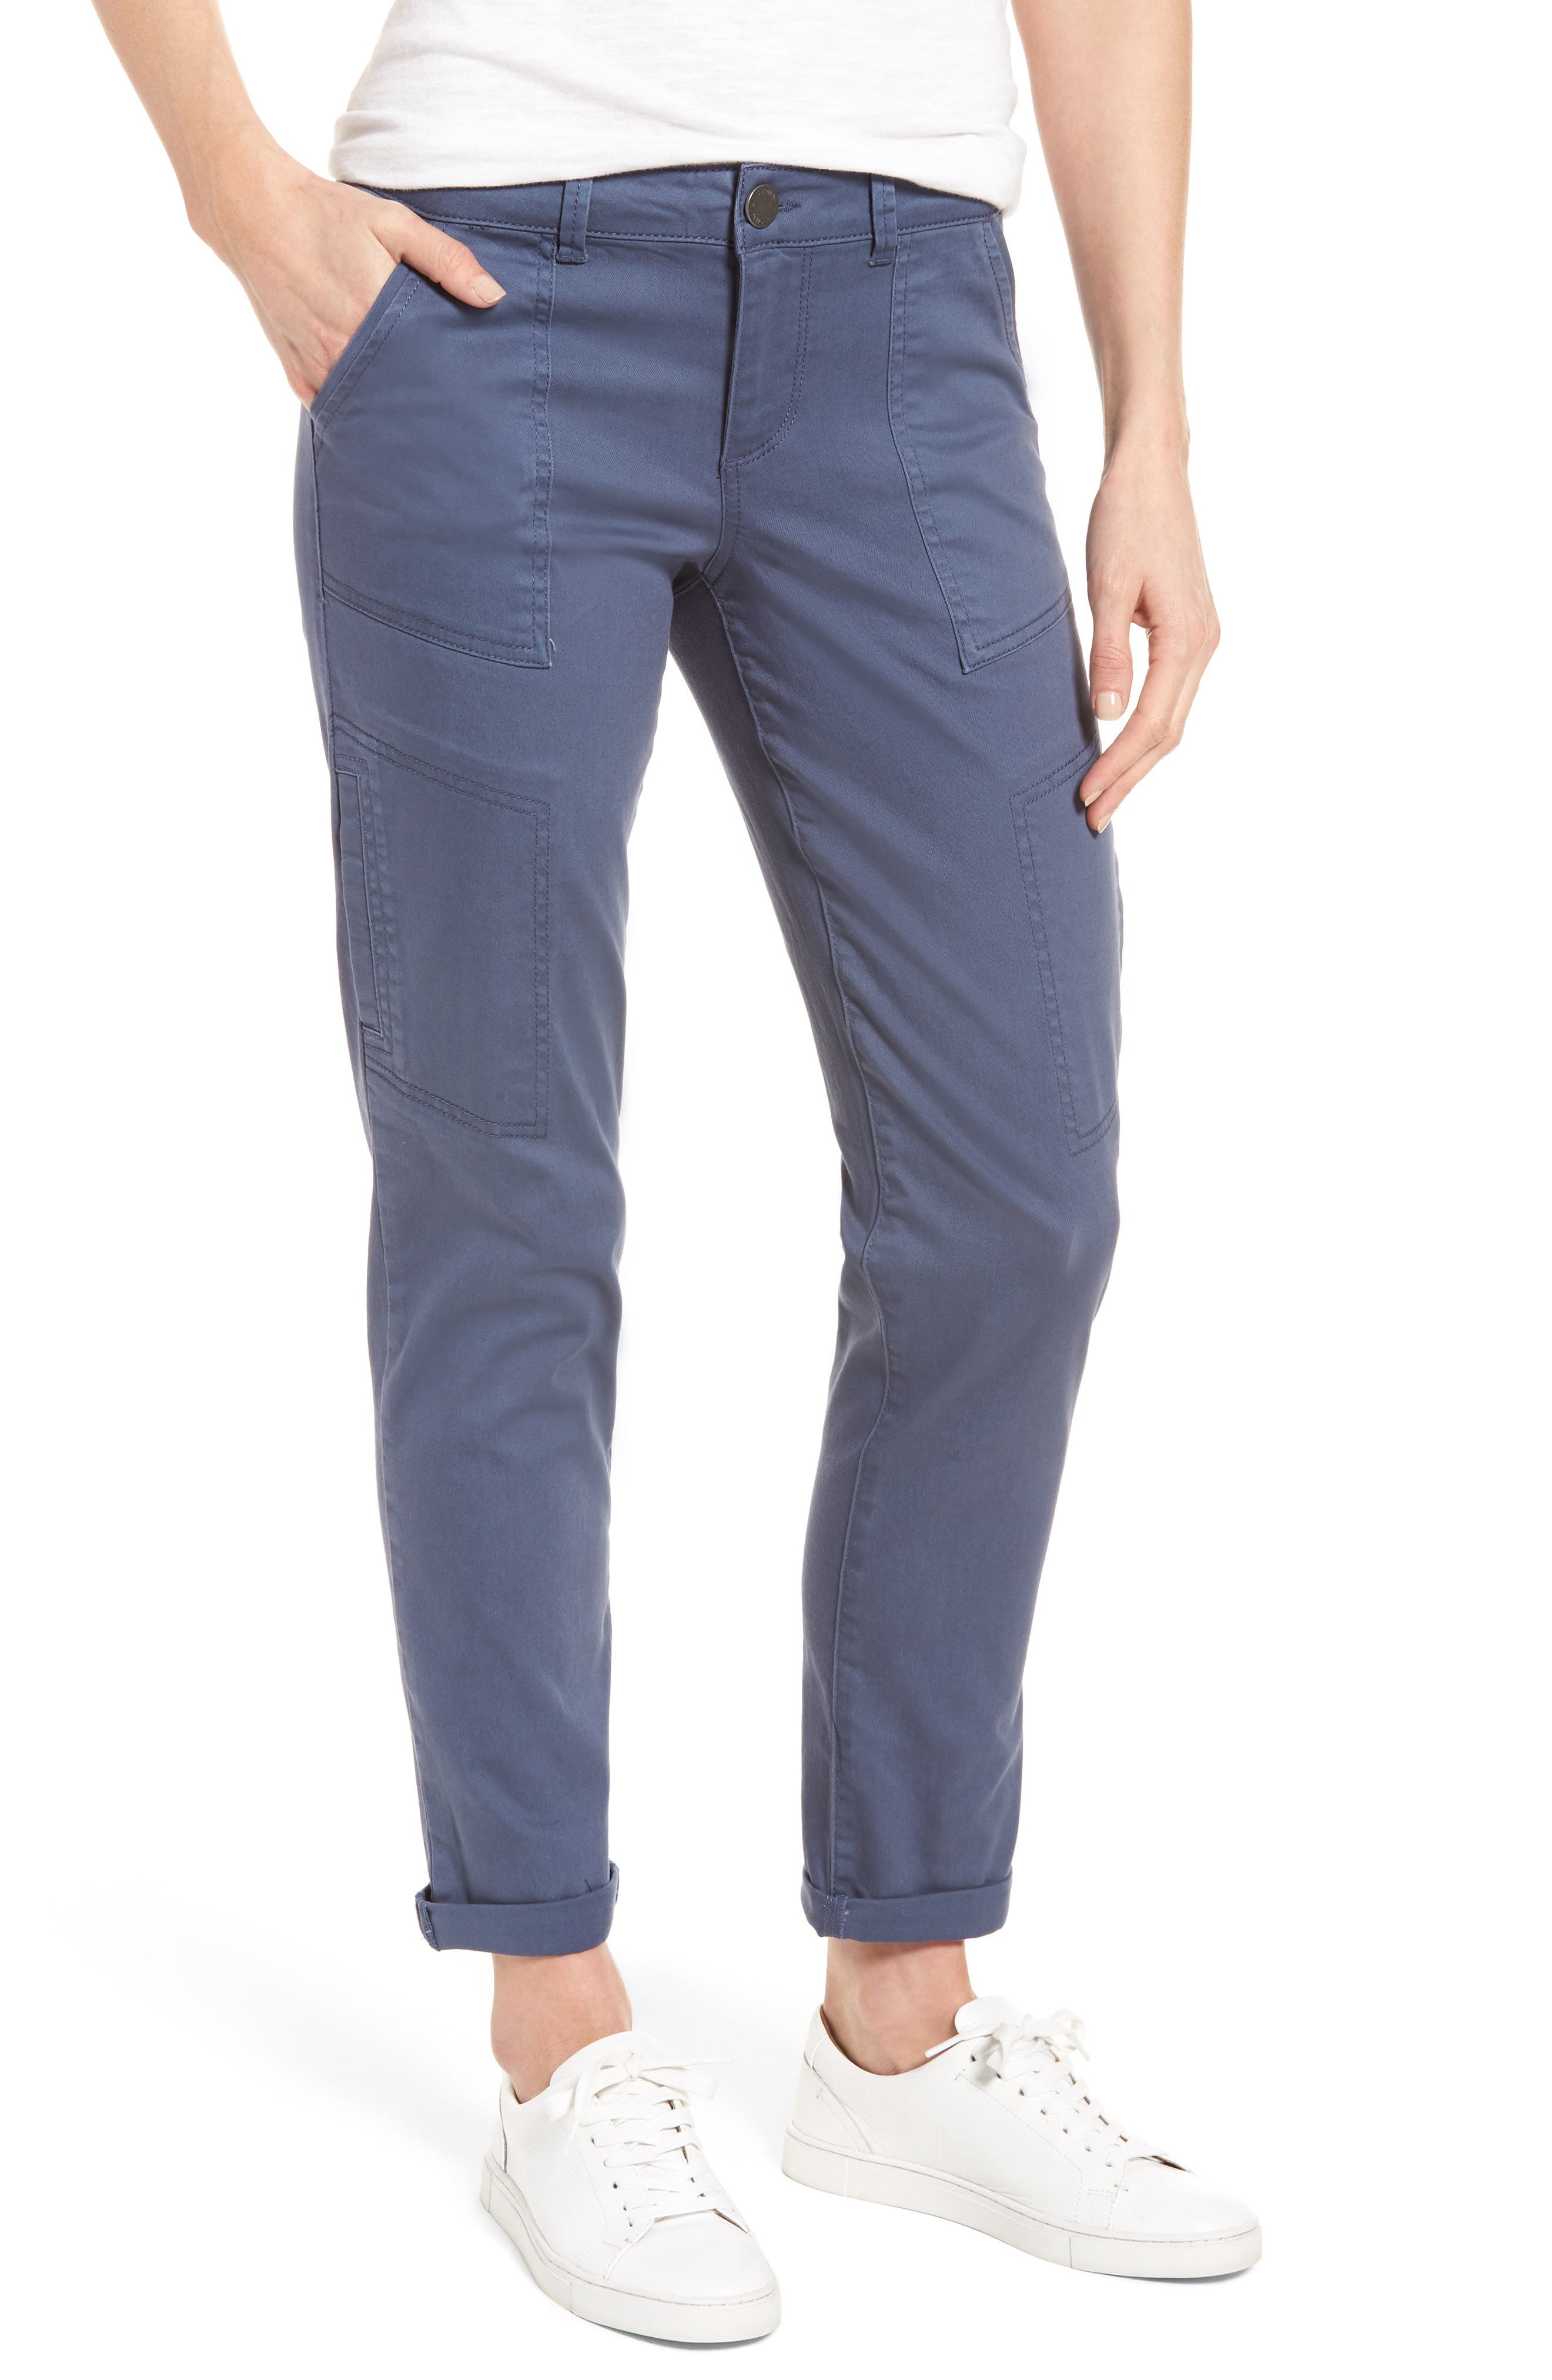 Main Image - Wit & Wisdom Skinny Cargo Pants (Regular & Petite) (Nordstrom Exclusive)